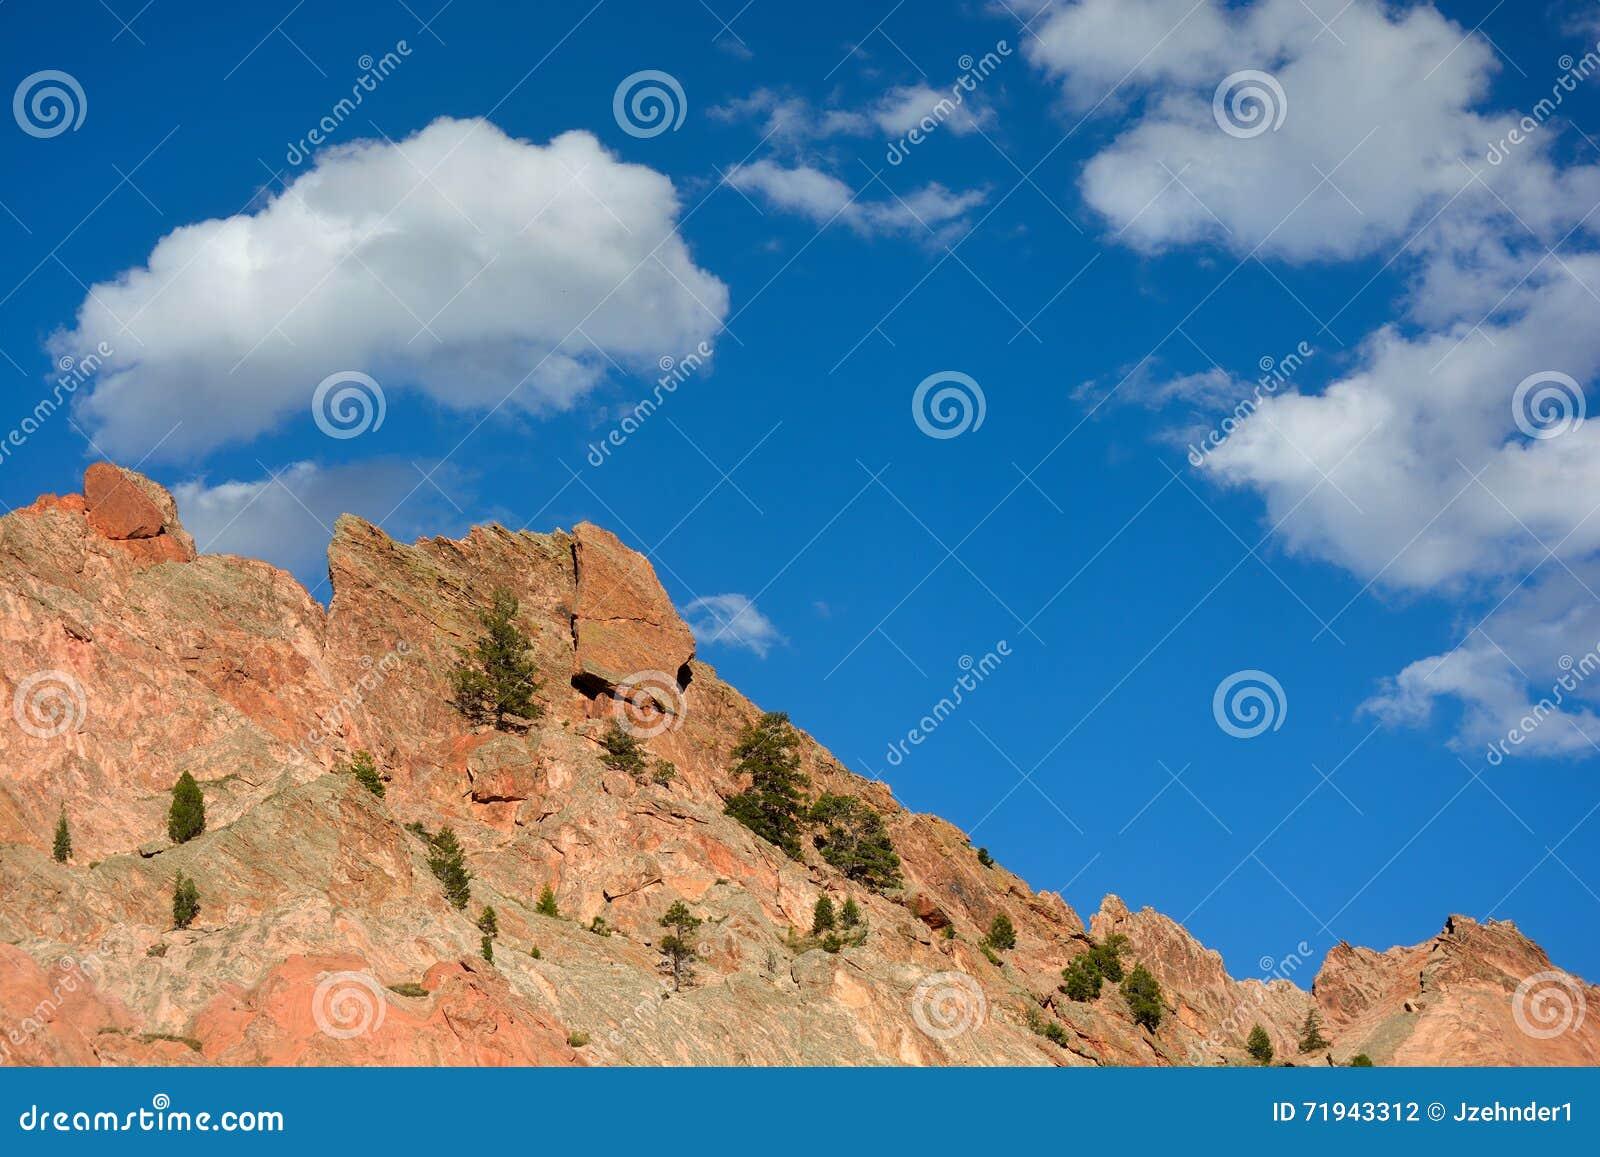 Сад богов Колорадо-Спрингс